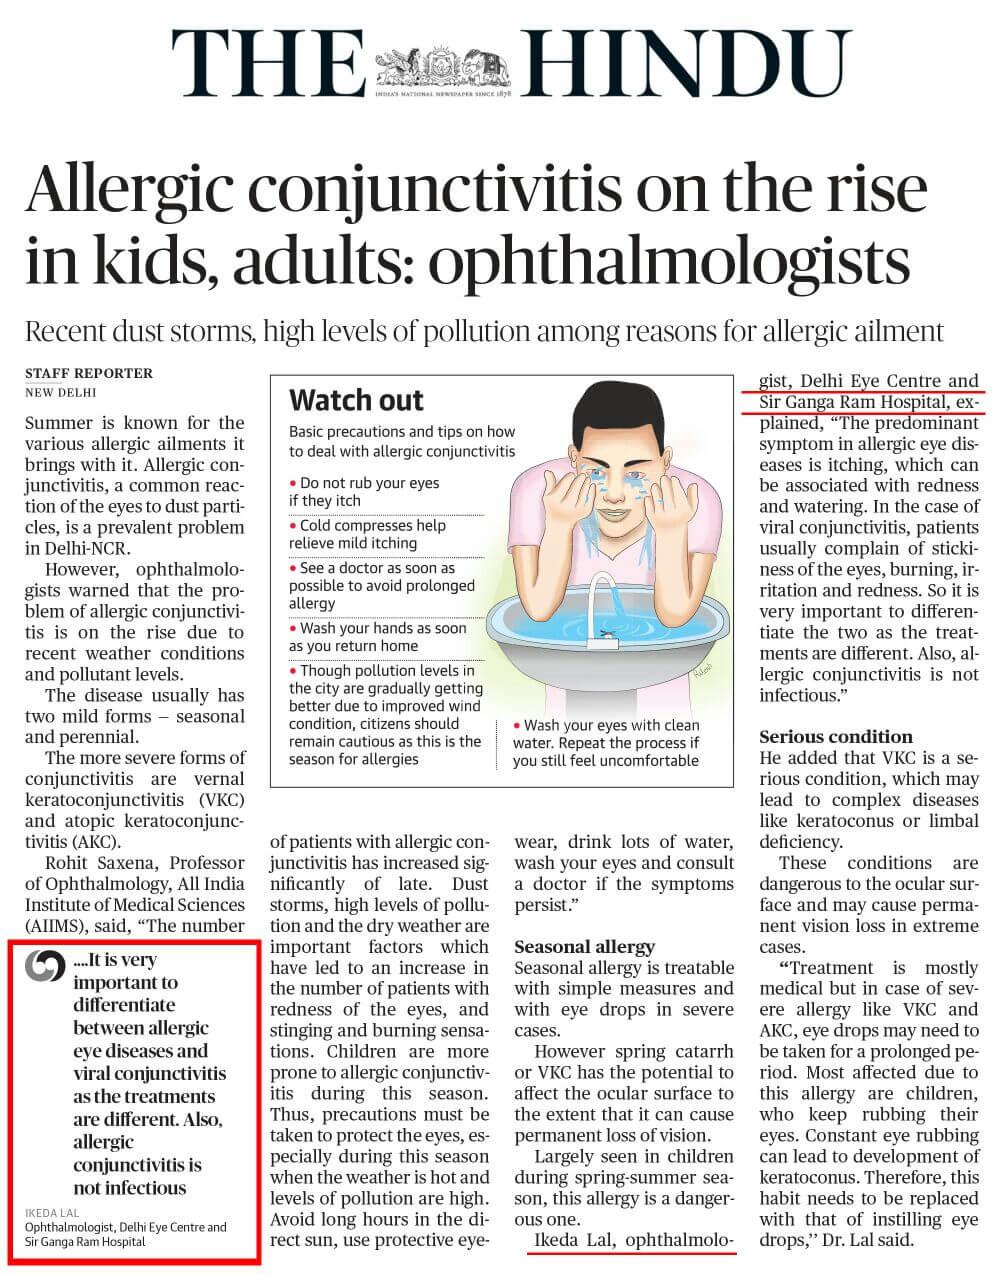 Allergic conjunctivitis tips by Delhi eye Centre